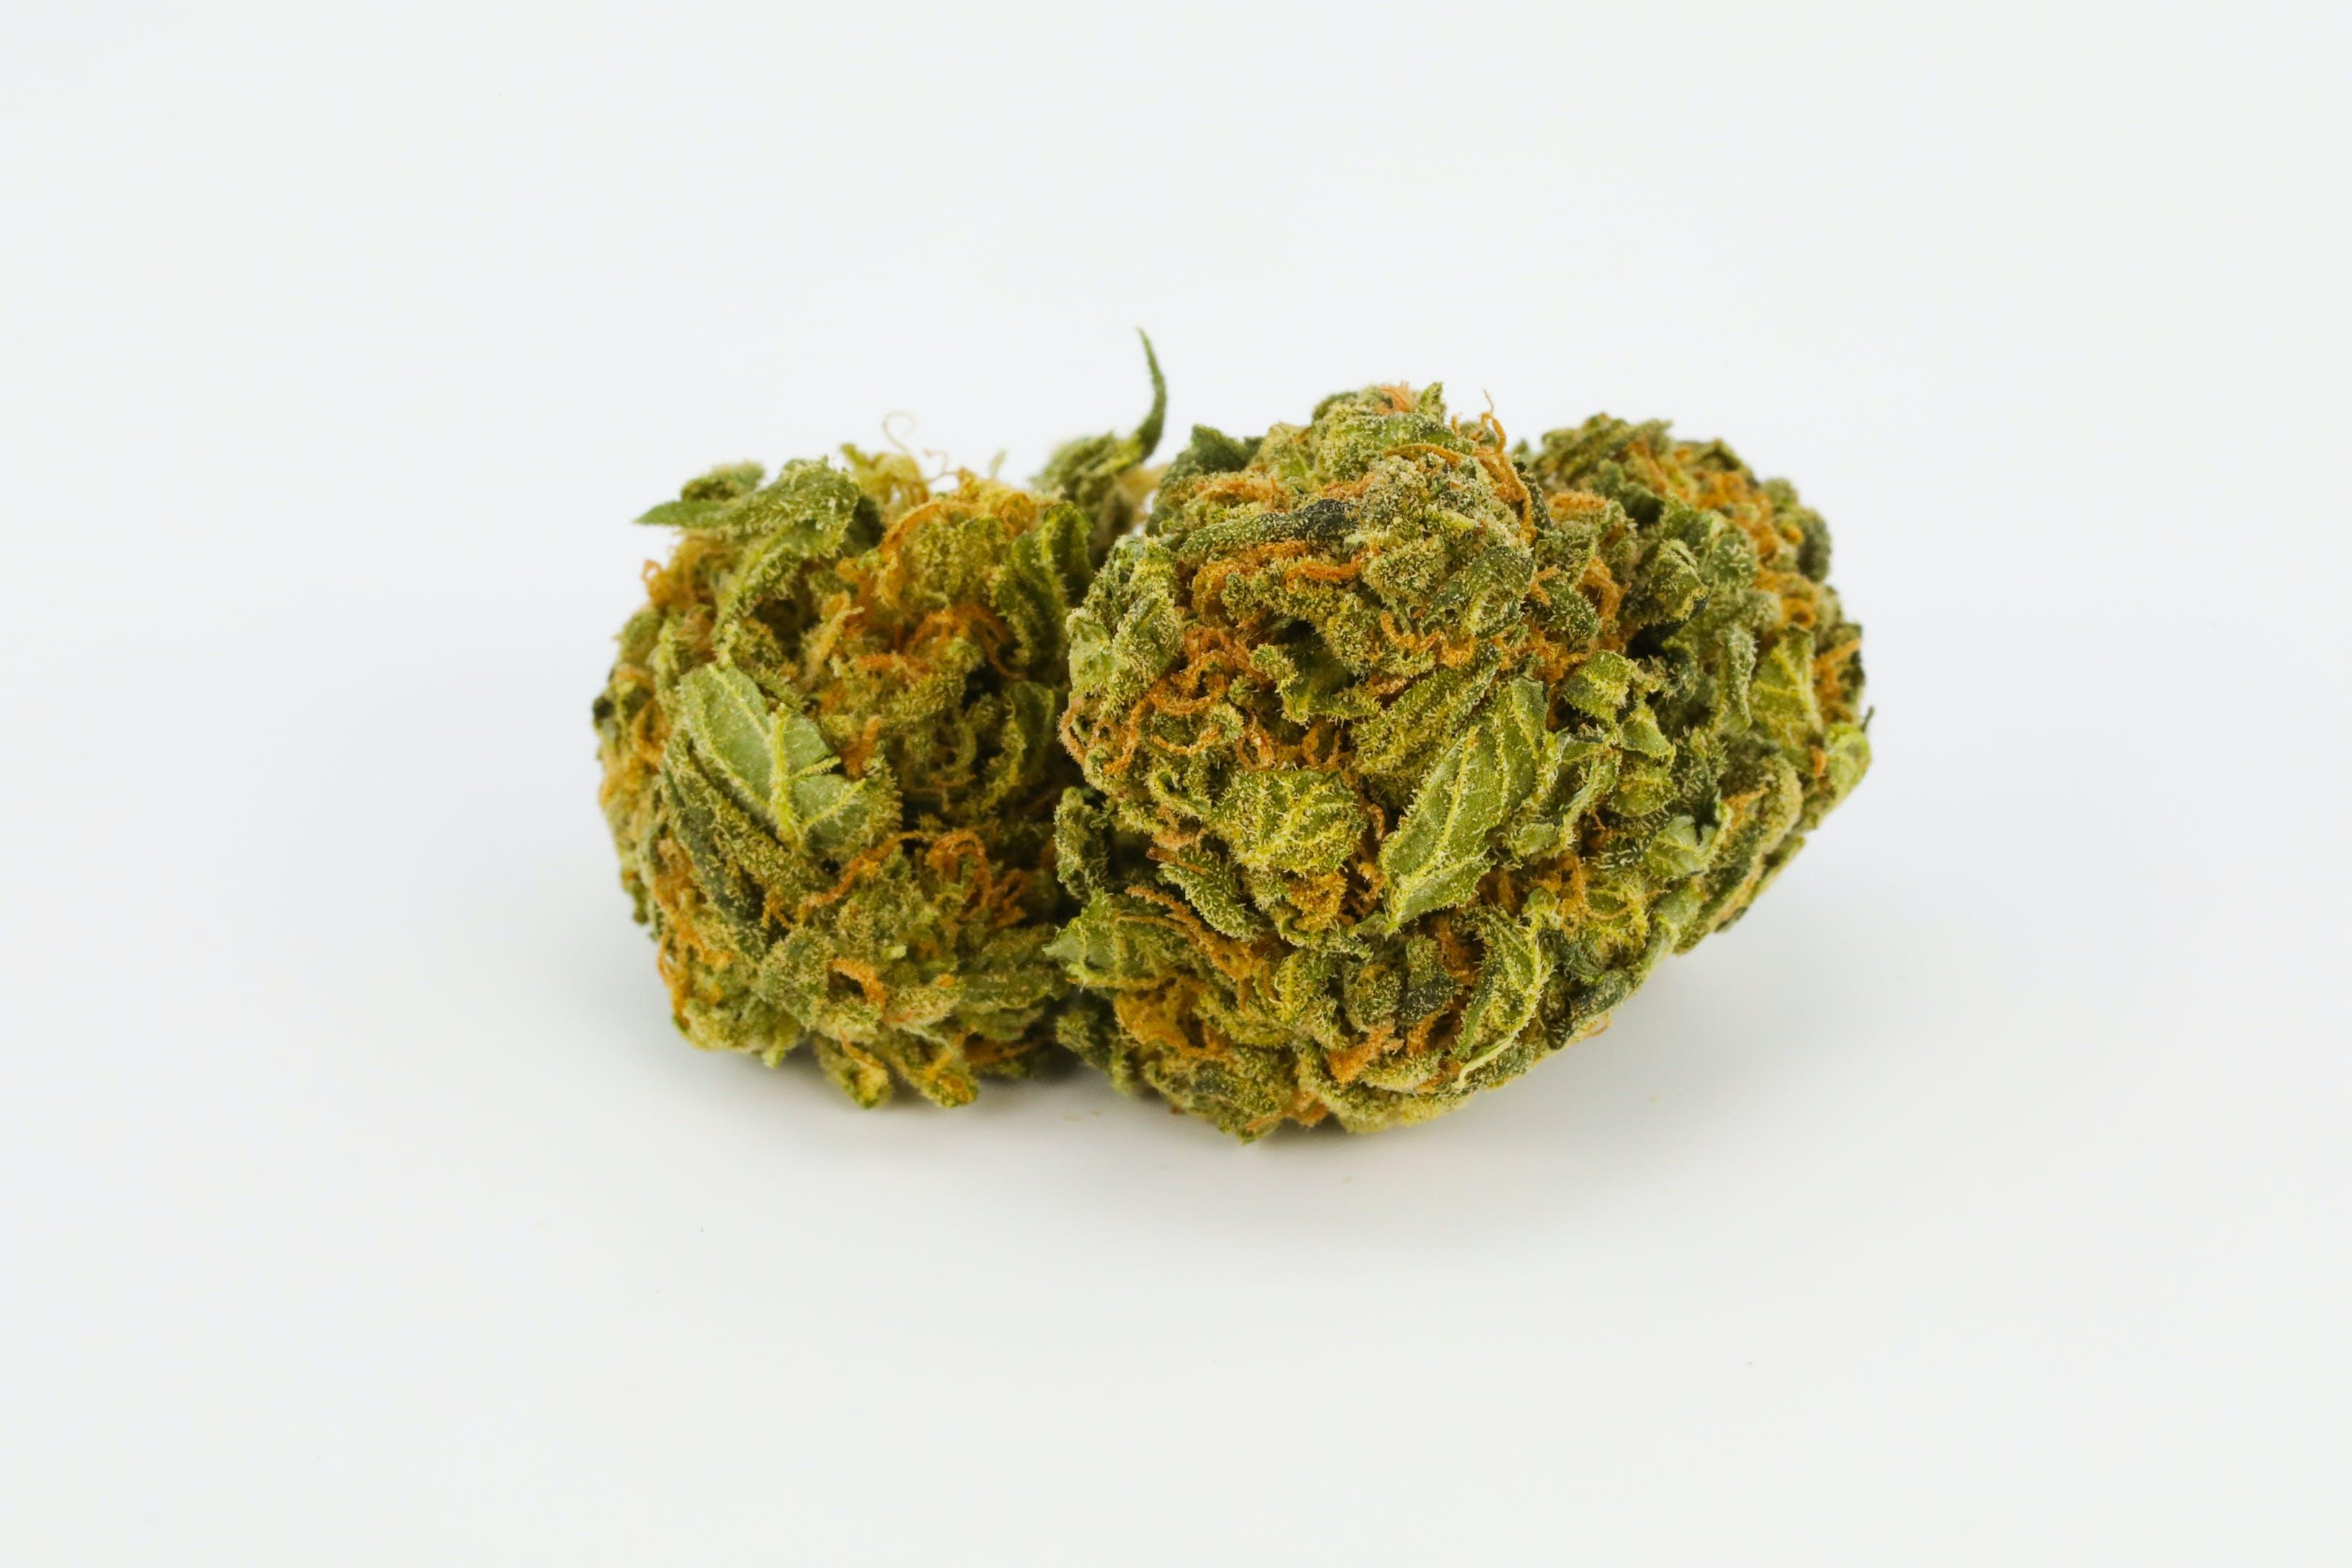 Herijuana Weed; Herijuana Cannabis Strain; Herijuana Hybrid Marijuana Strain